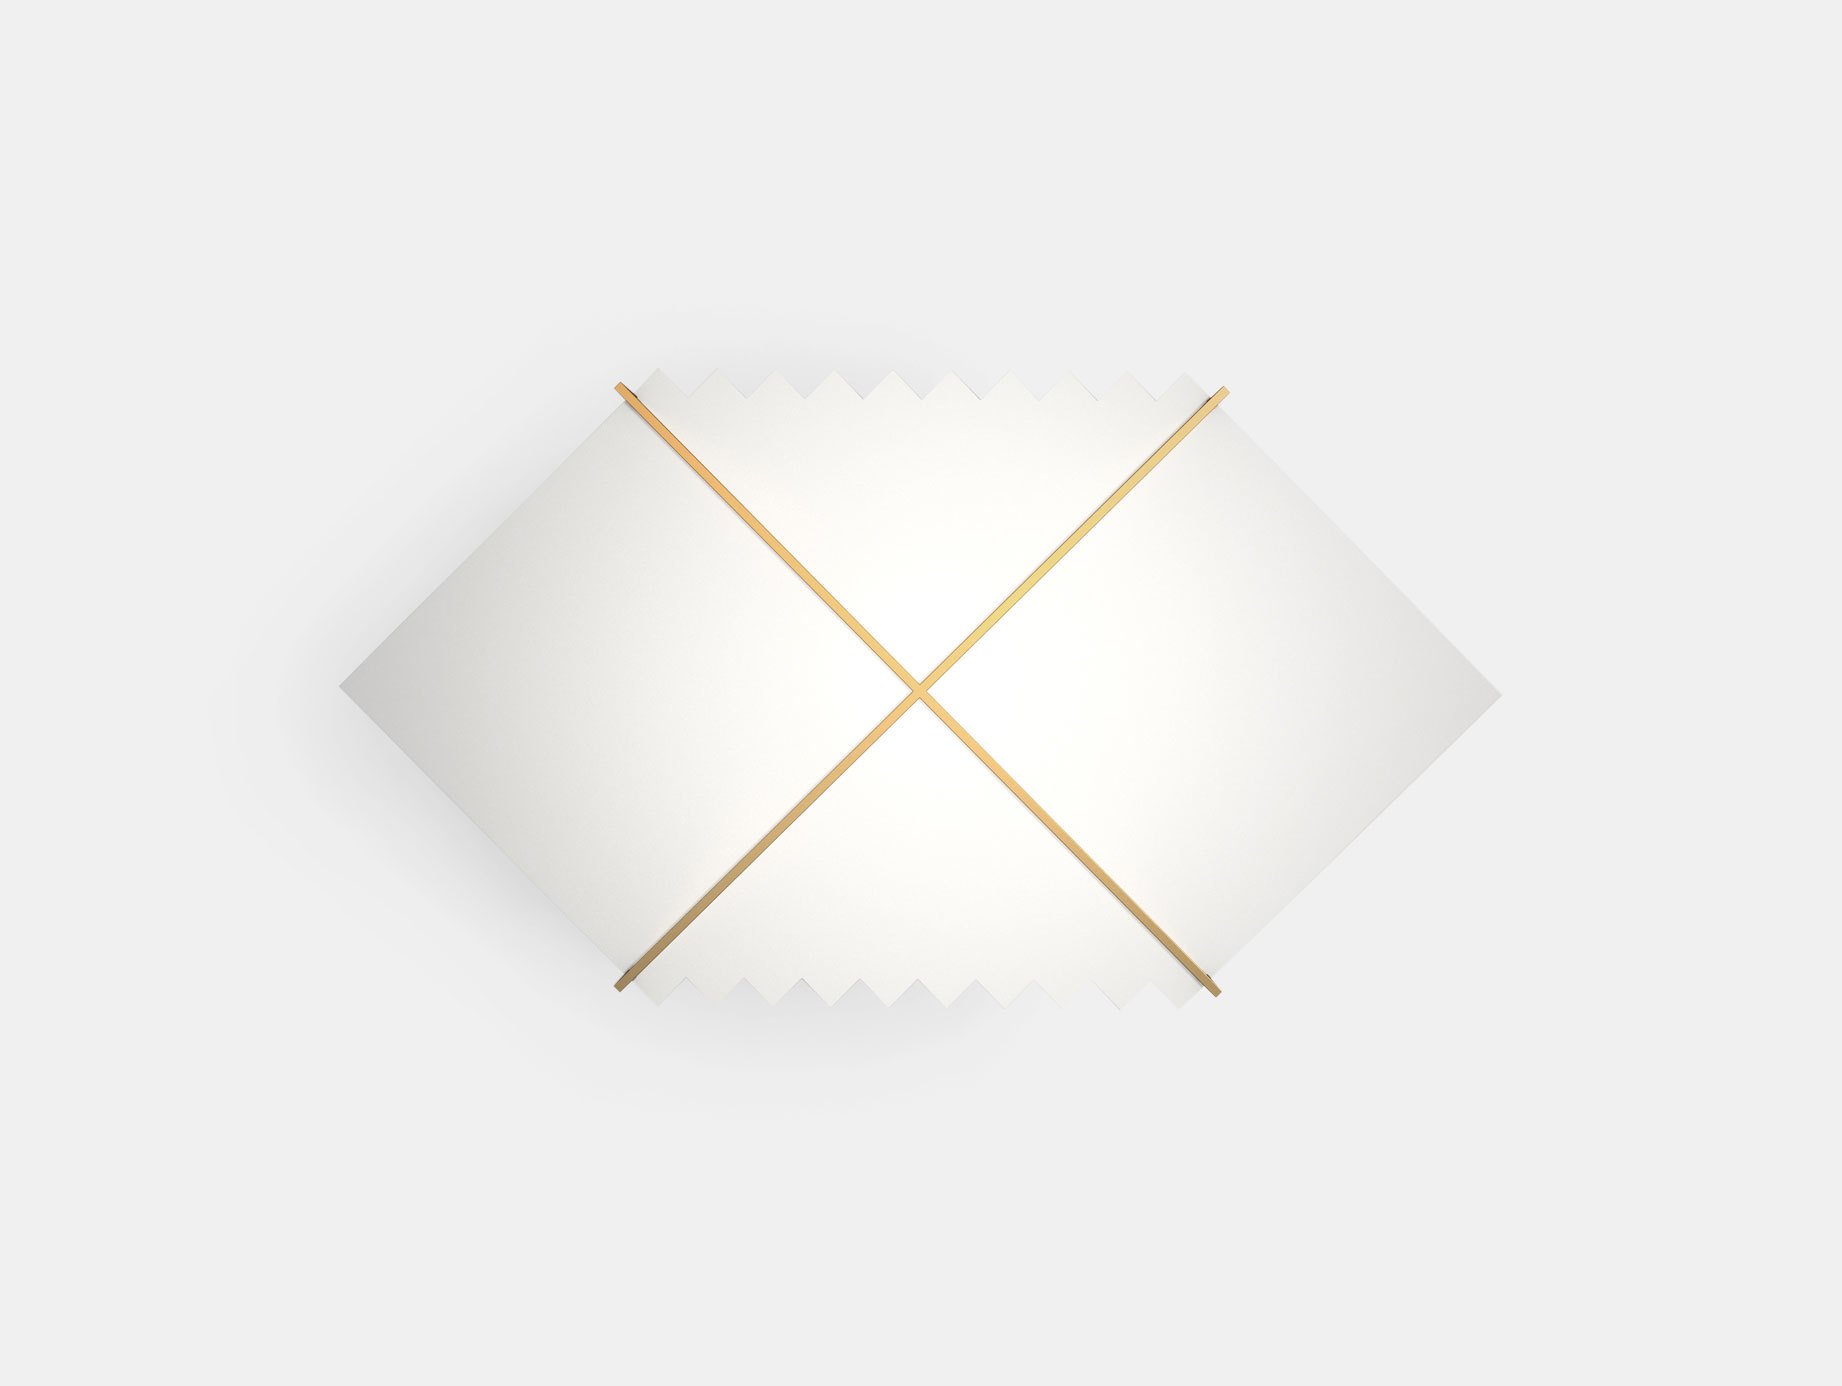 Atelier Areti Black Hole Wall Ceiling Light Brass Gwendolyn Guillane Kerschbaumer